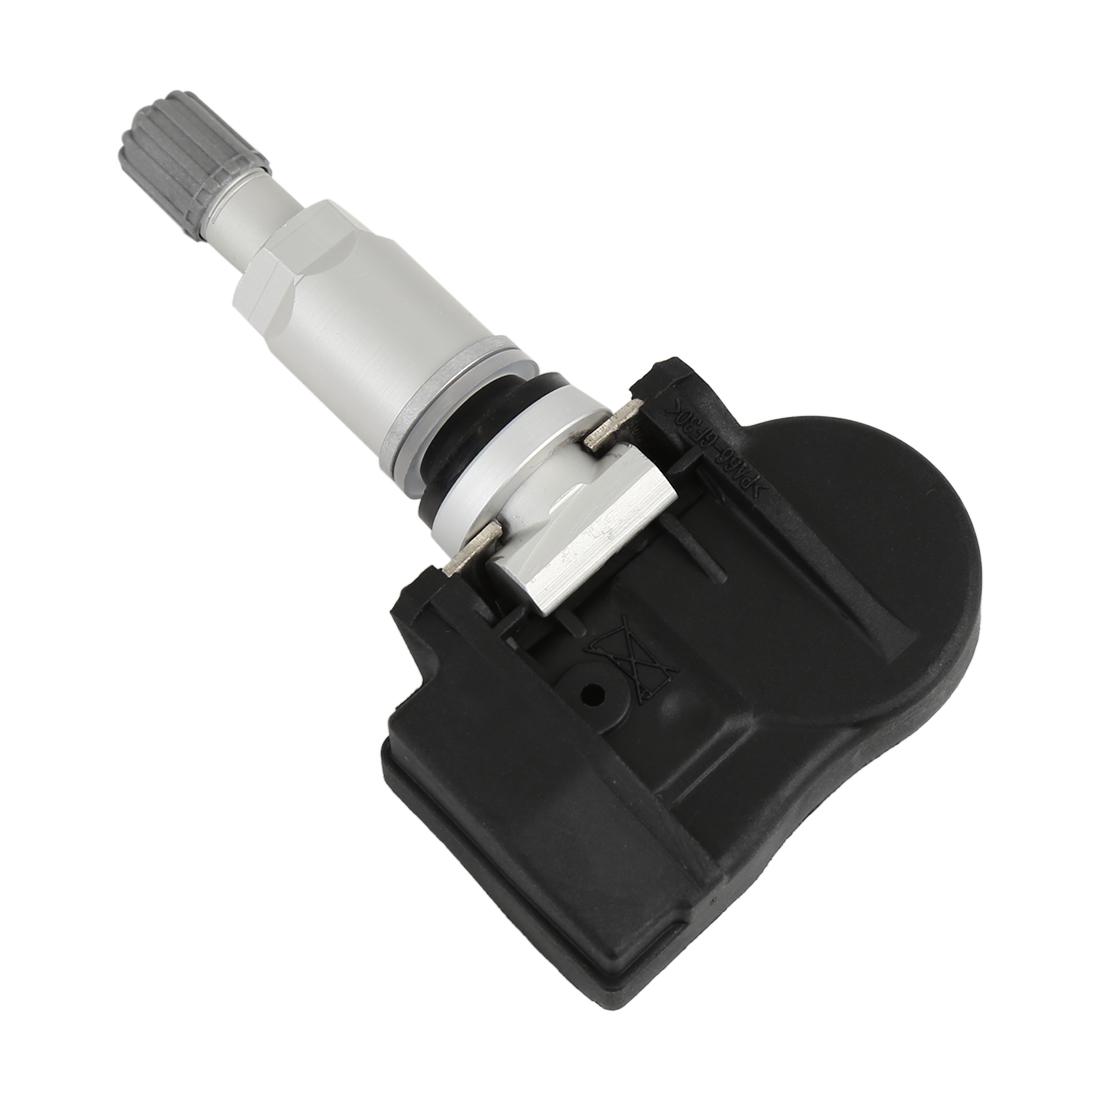 36106855539 36106856209 Car Tire Pressure Sensor TPMS 433MHz for BMW 1 F20